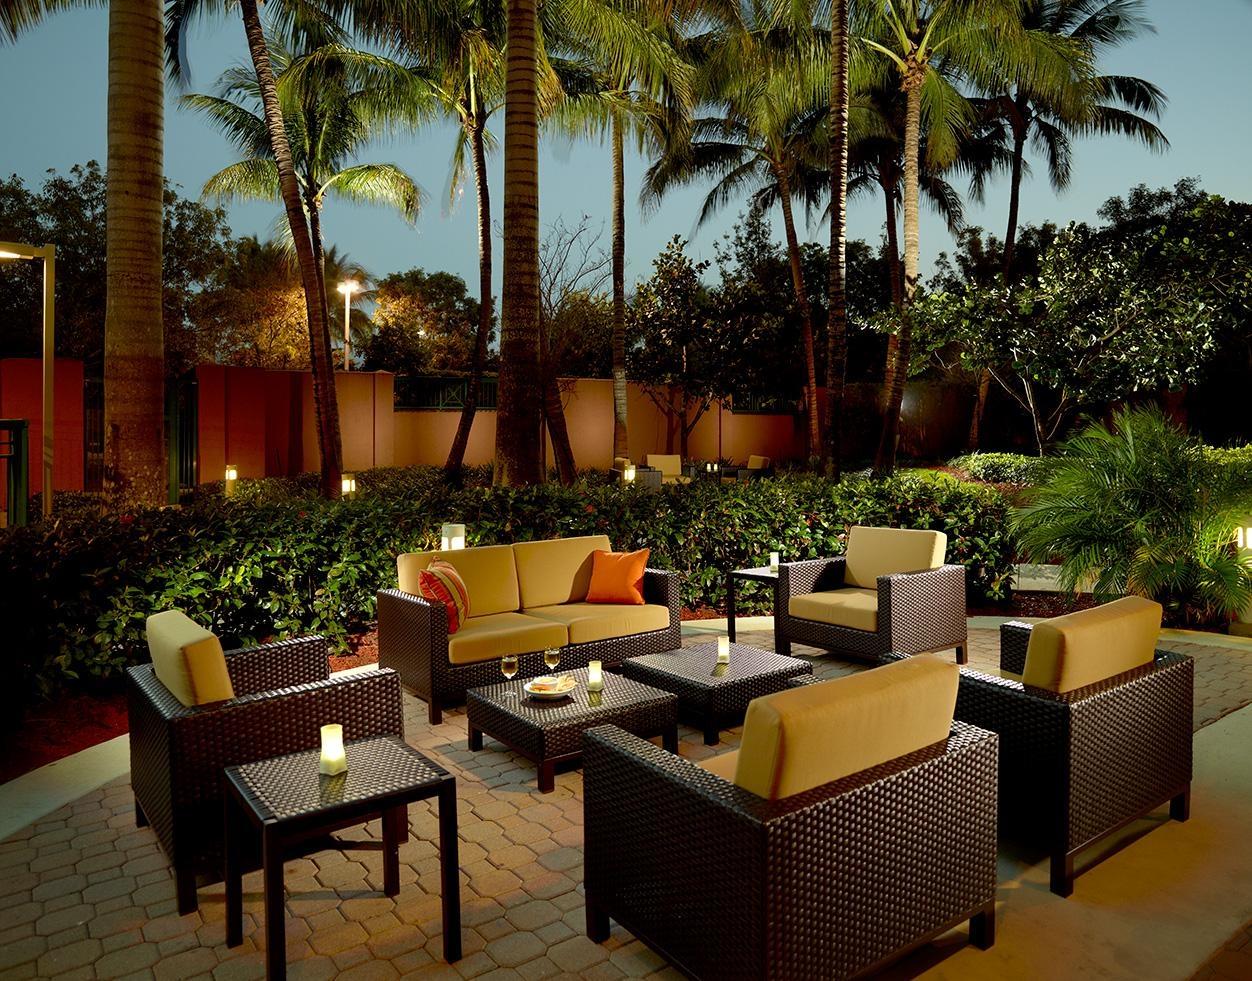 Travel Agency Fort Lauderdale Fl